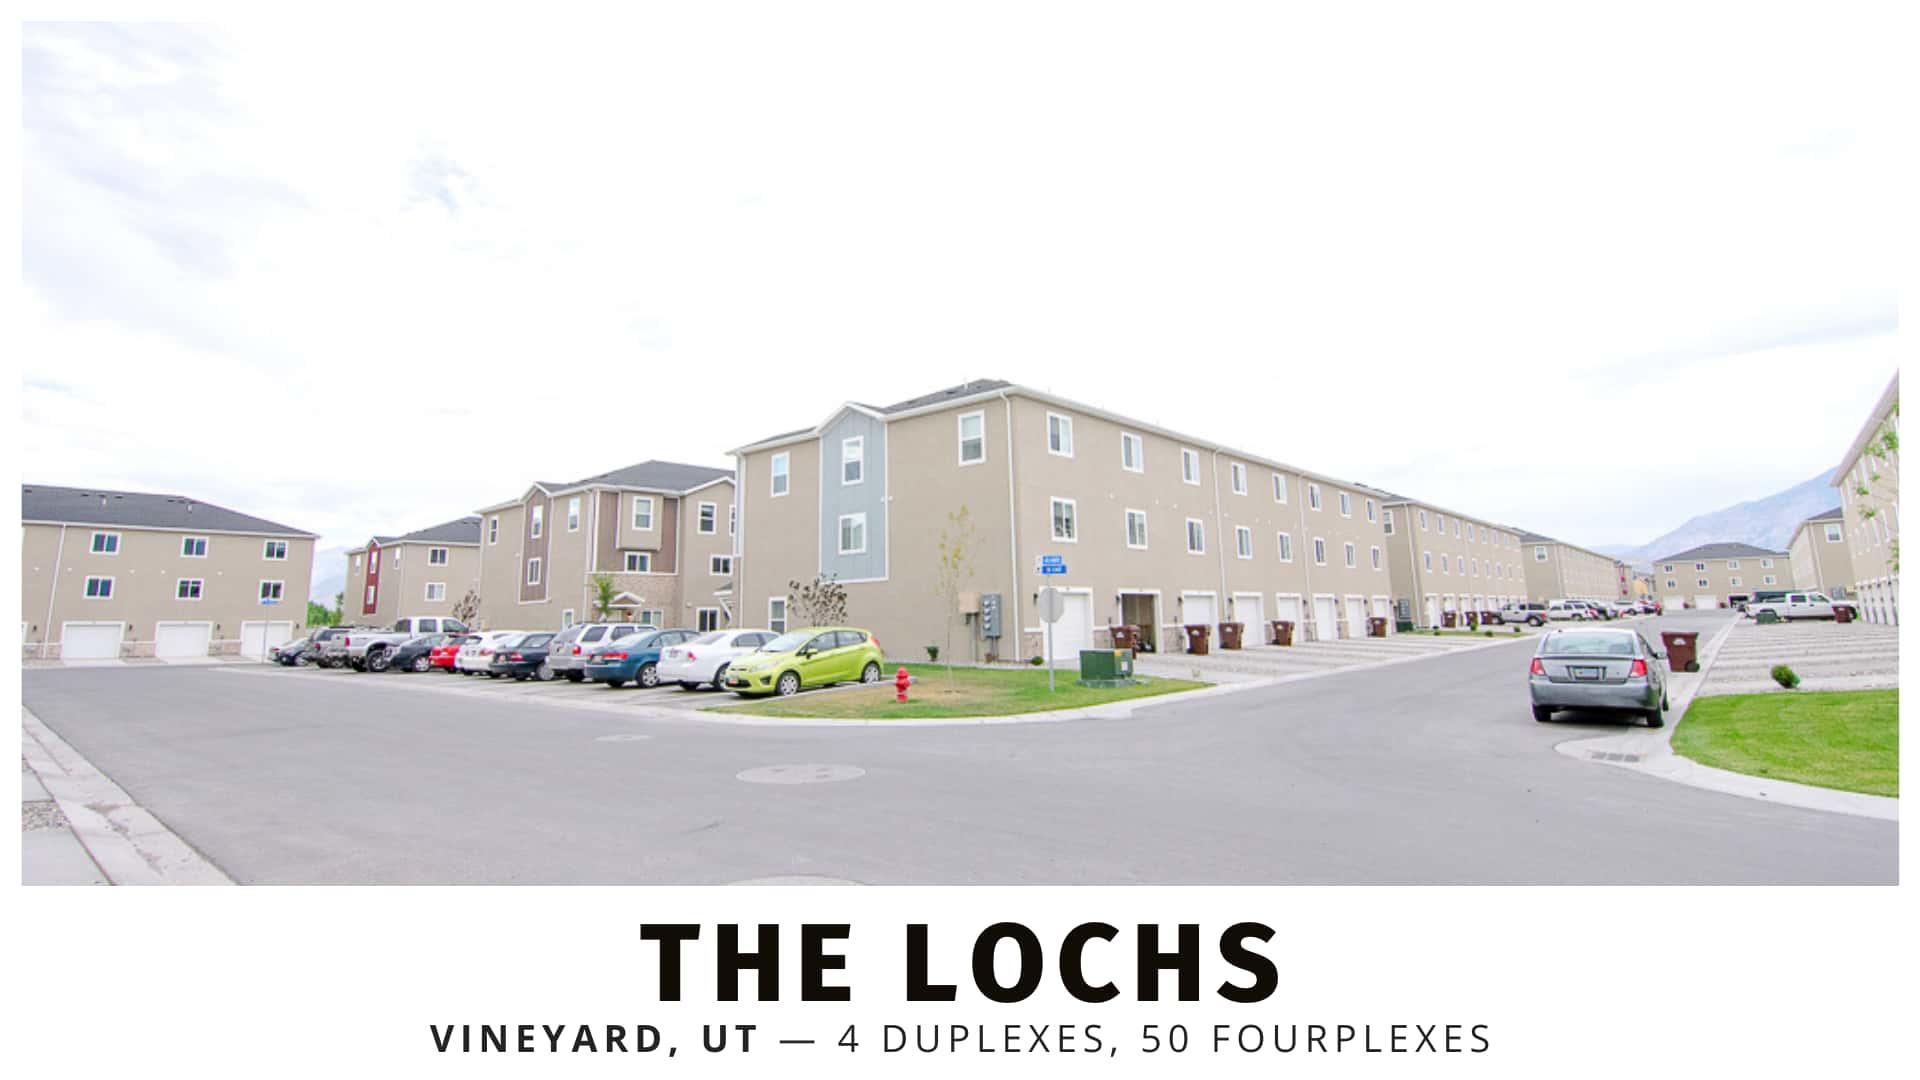 The Lochs Duplexes and Fourplexes in Vineyard, Utah